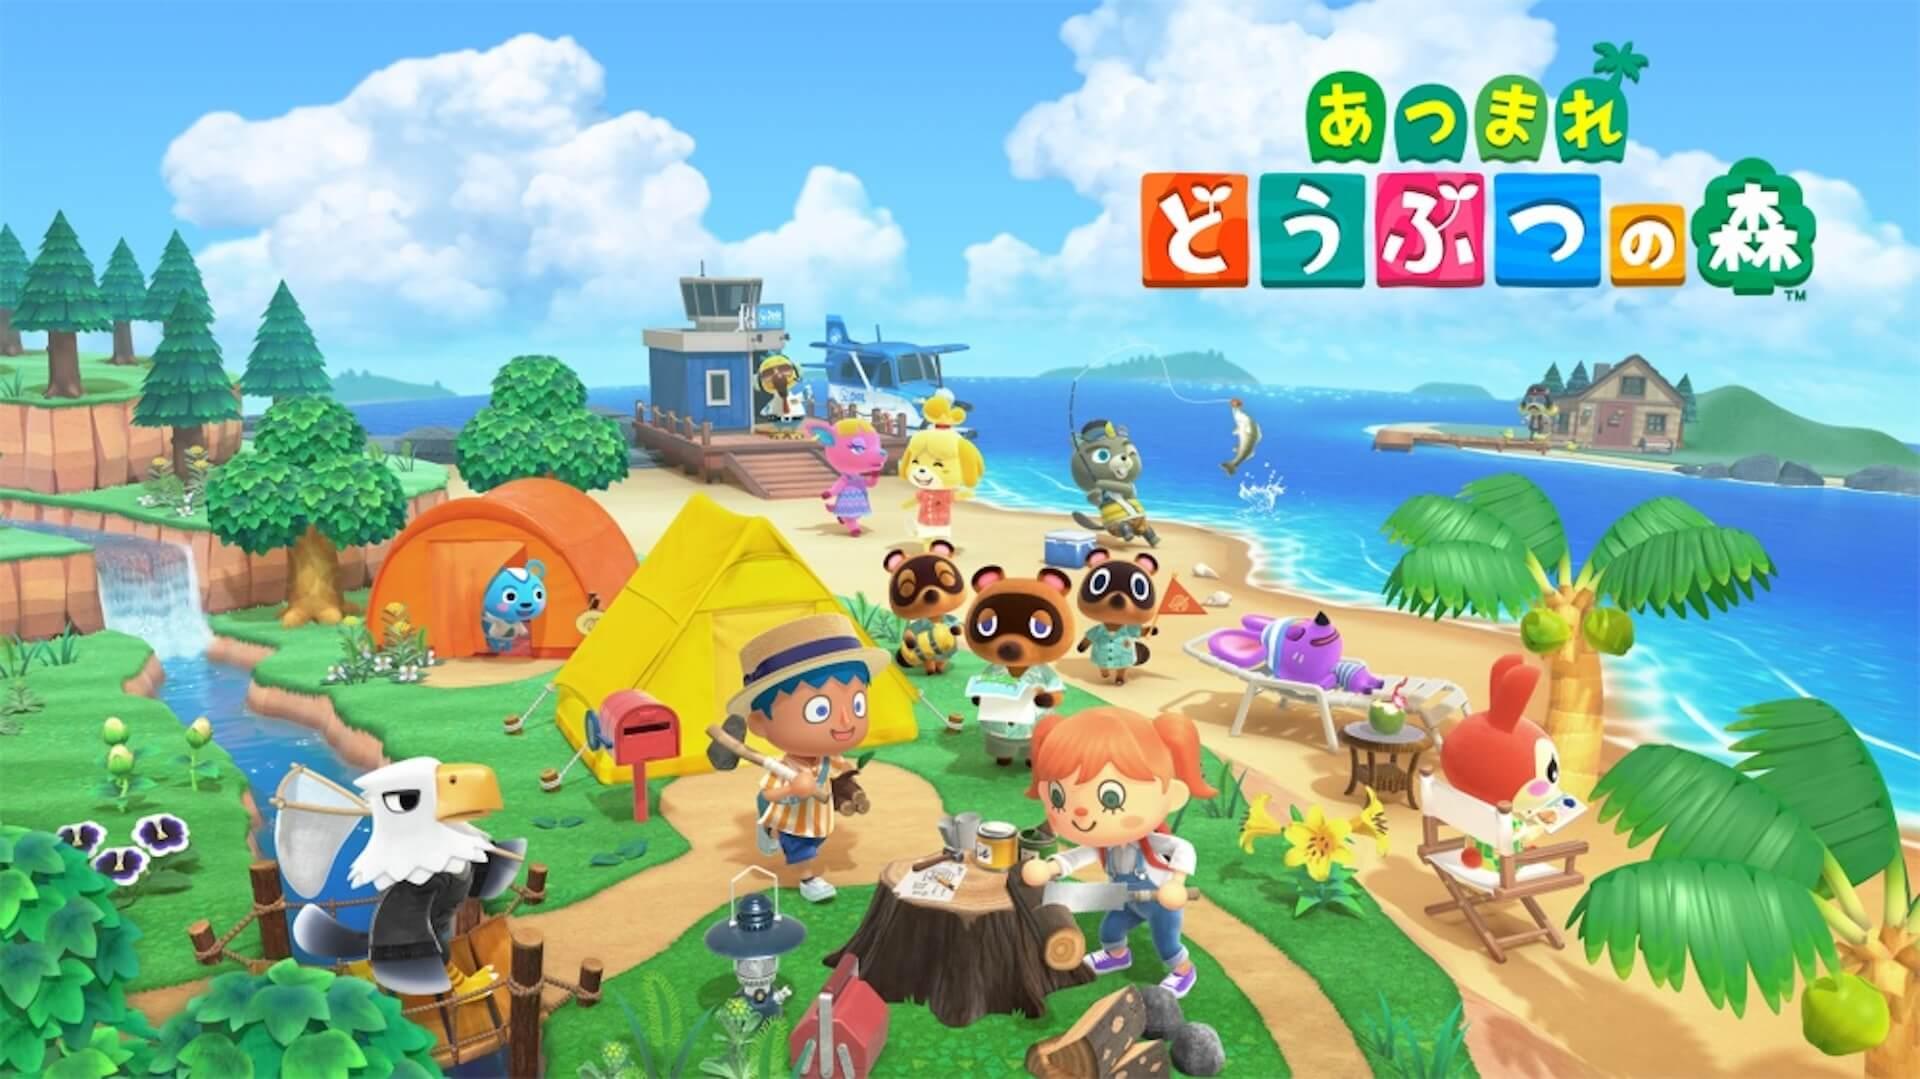 Nintendo Switch『あつまれ どうぶつの森』がSwitchのゲームソフト歴代セールスNo.1に! tech200514_animalcrossing_1